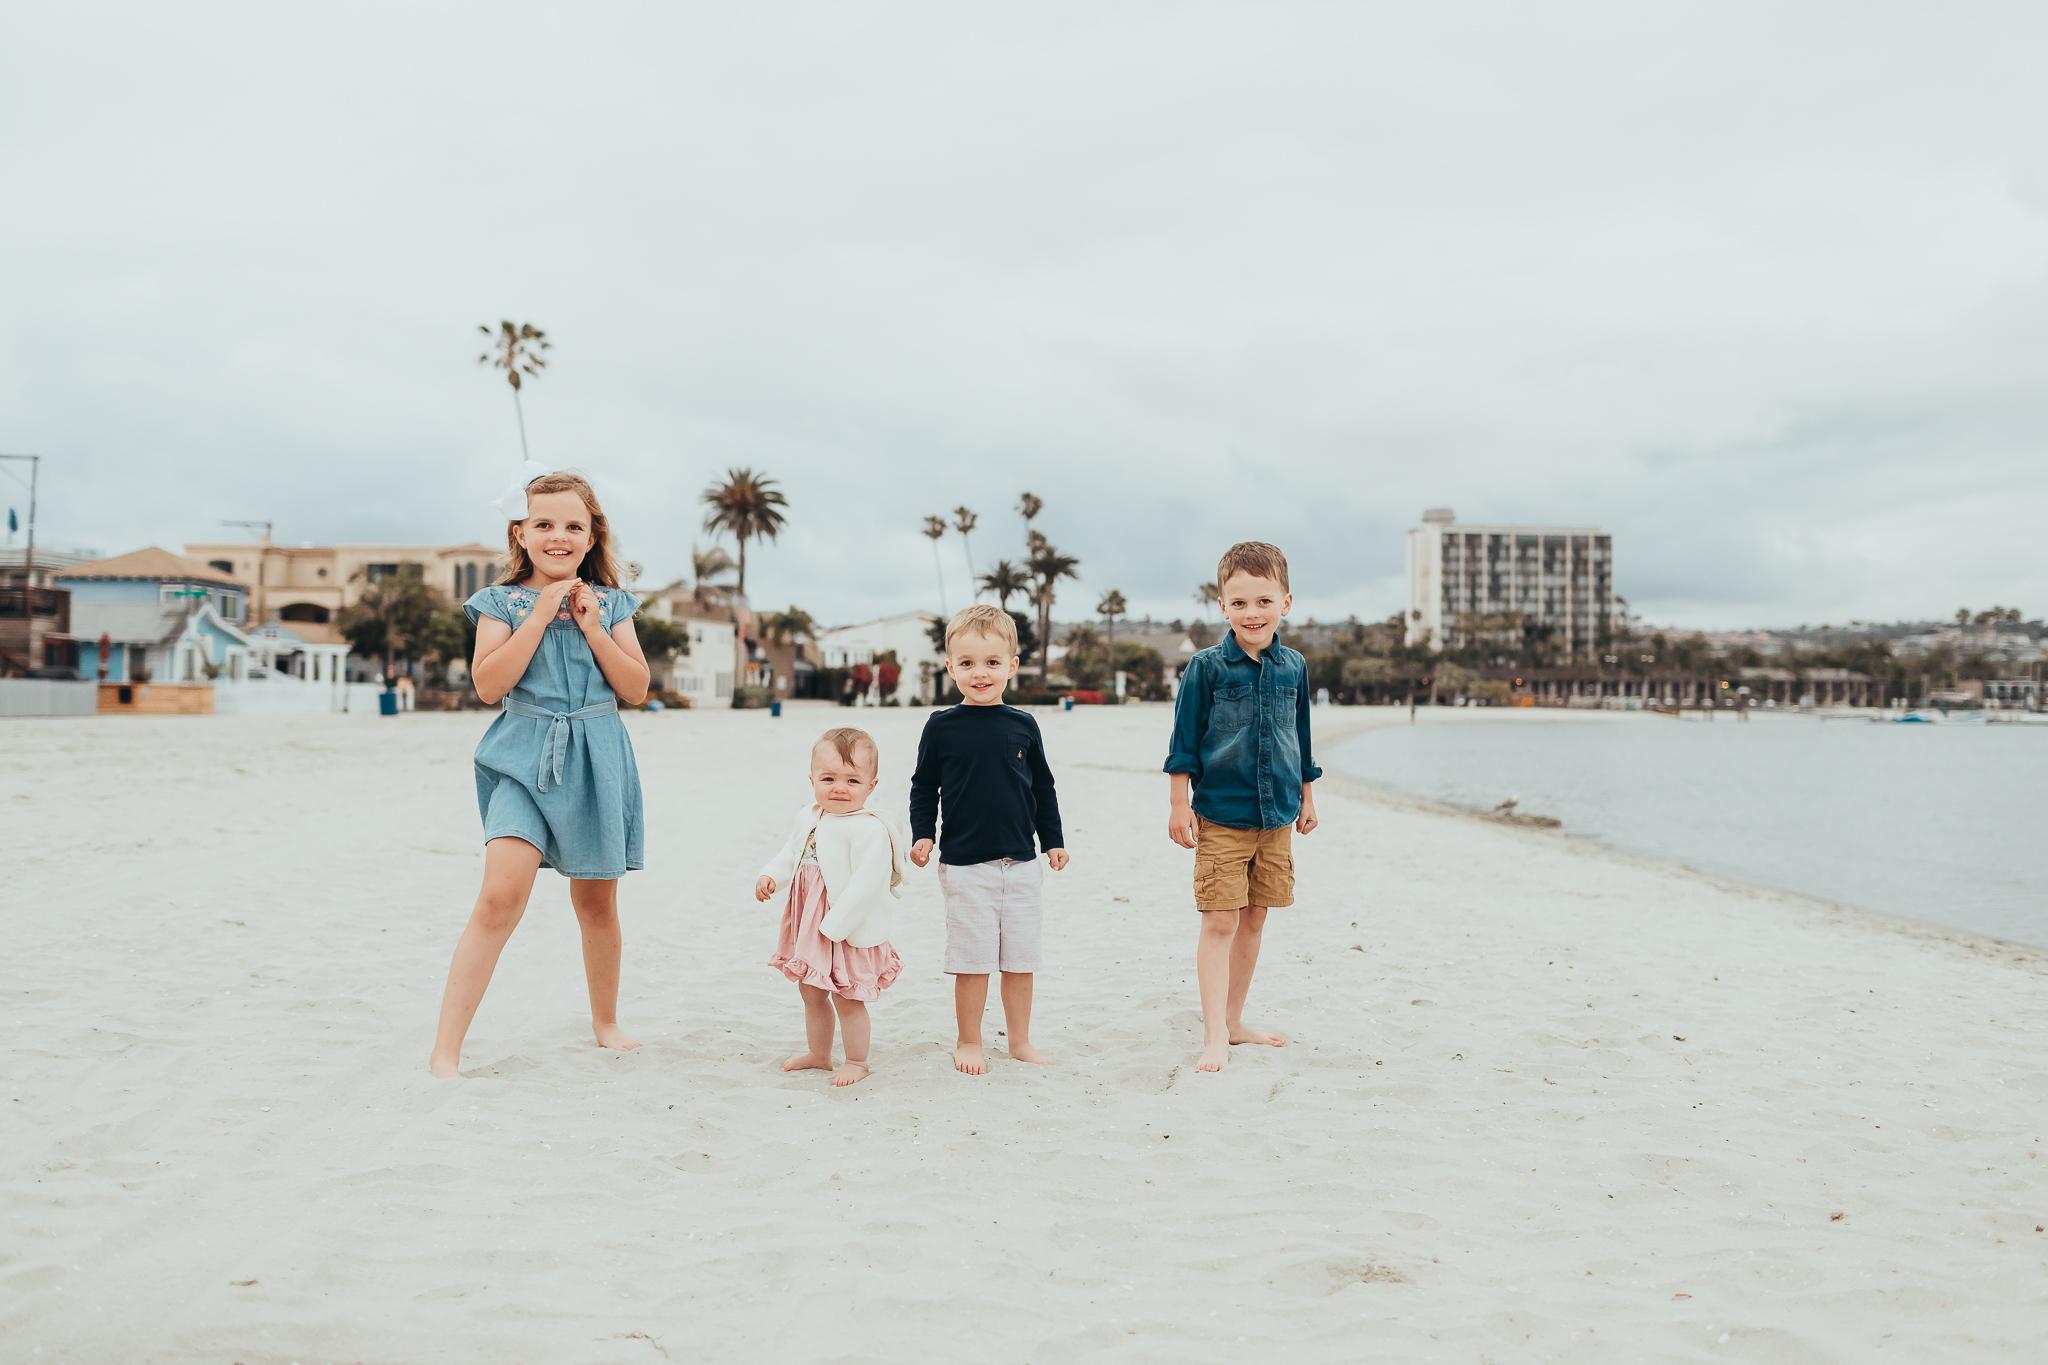 Mission Beach Vacation Family Photos San Diego Christine Dammann-9.jpg